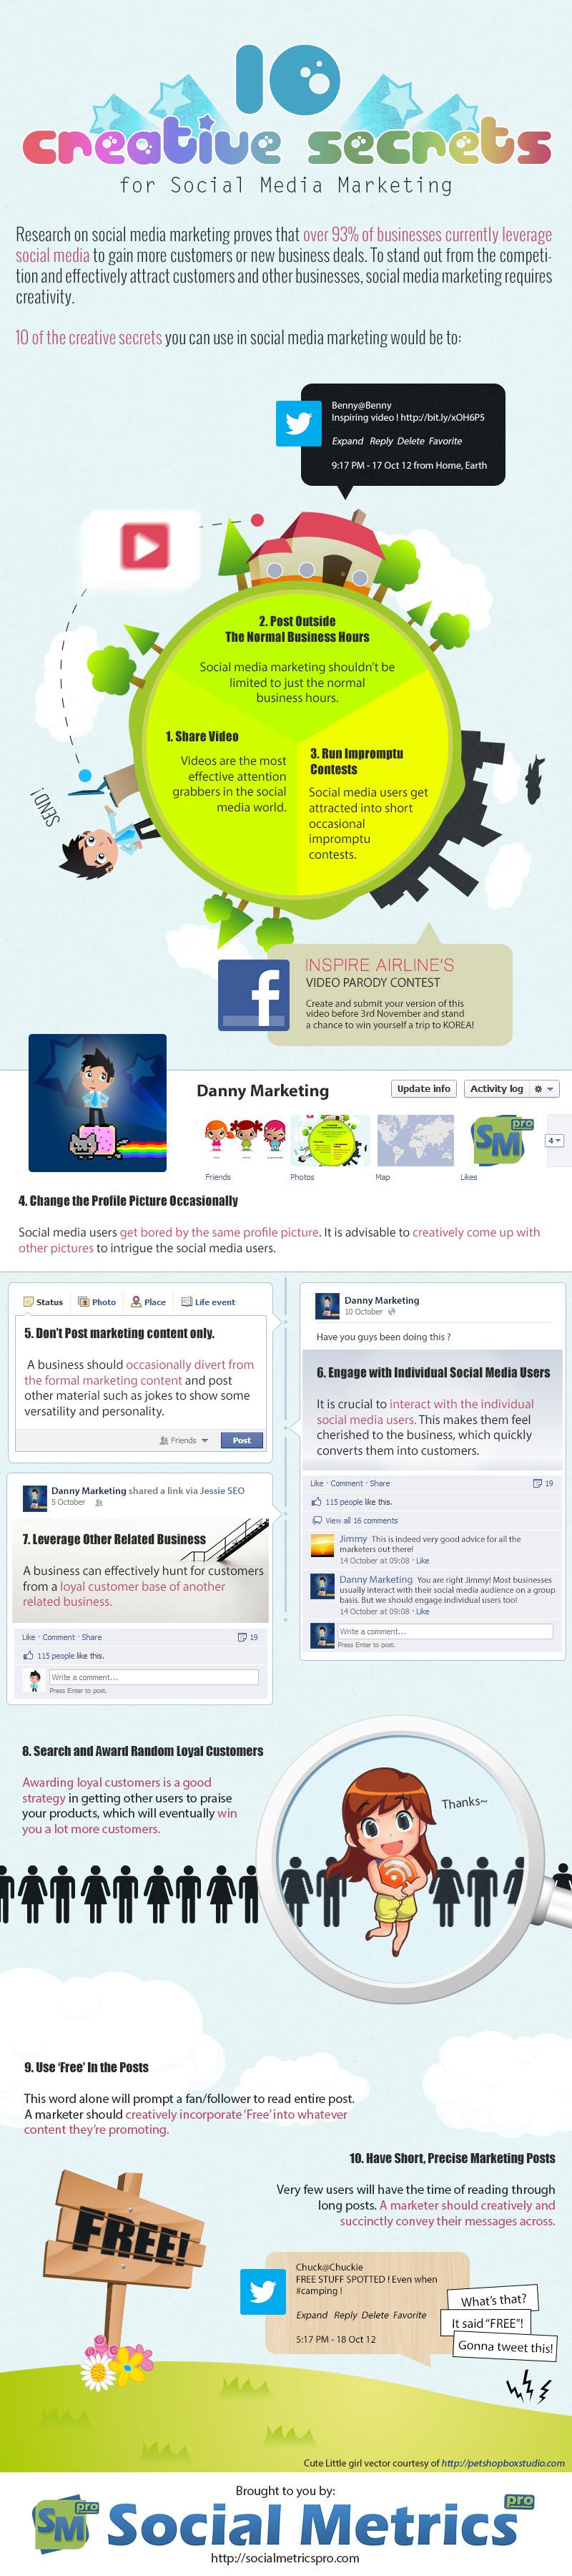 10 secretos creativos sobre Social Media Marketing